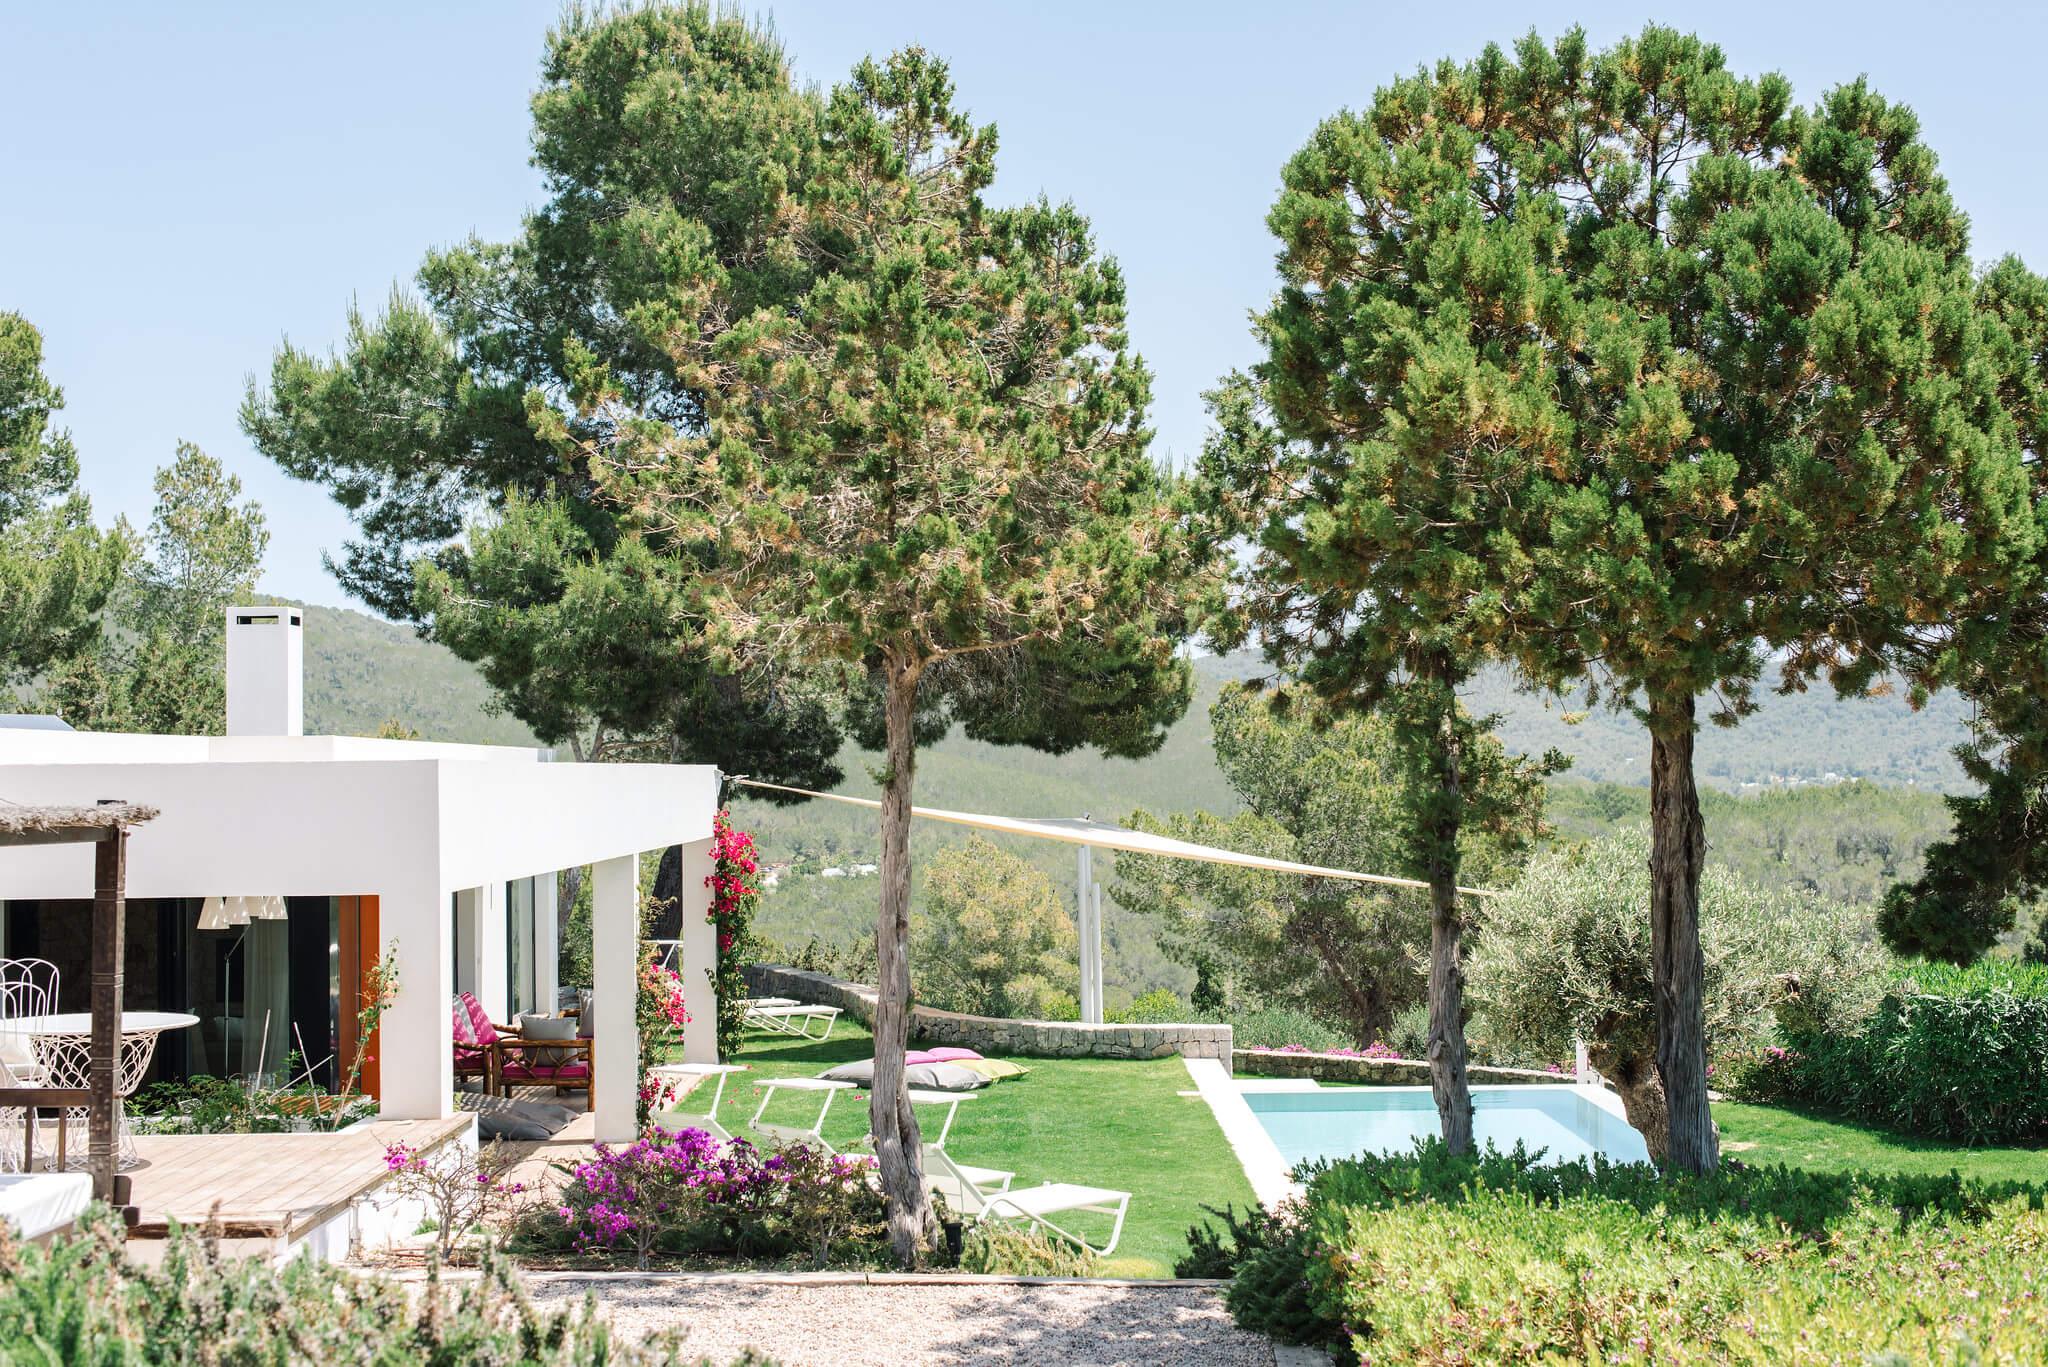 https://www.white-ibiza.com/wp-content/uploads/2020/06/white-ibiza-villas-can-jondal-exterior-from-entrance.jpg